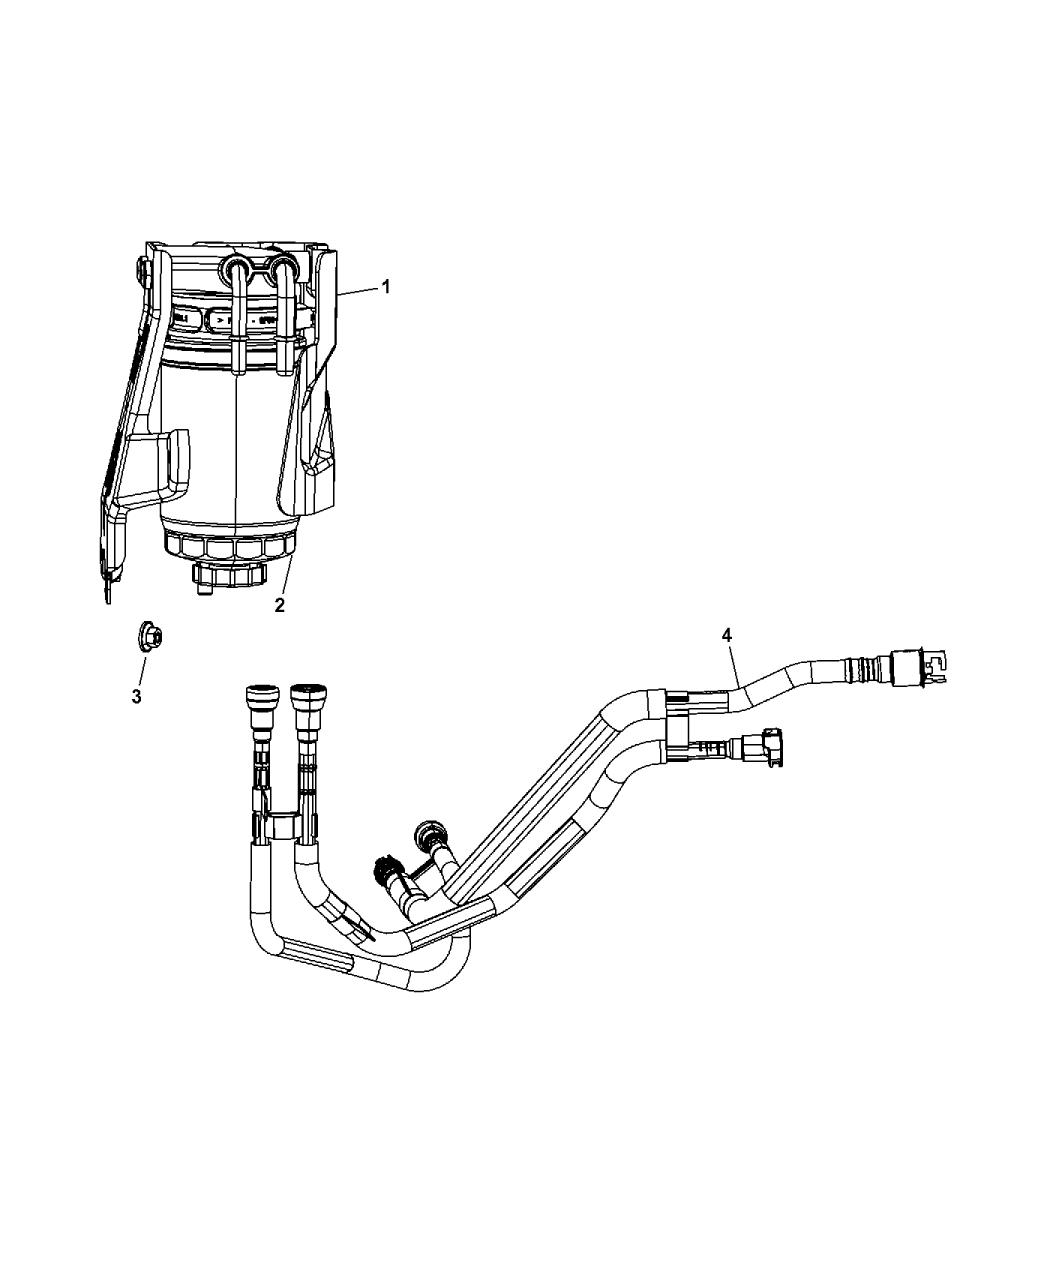 2011 Jeep Patriot Fuel Filter